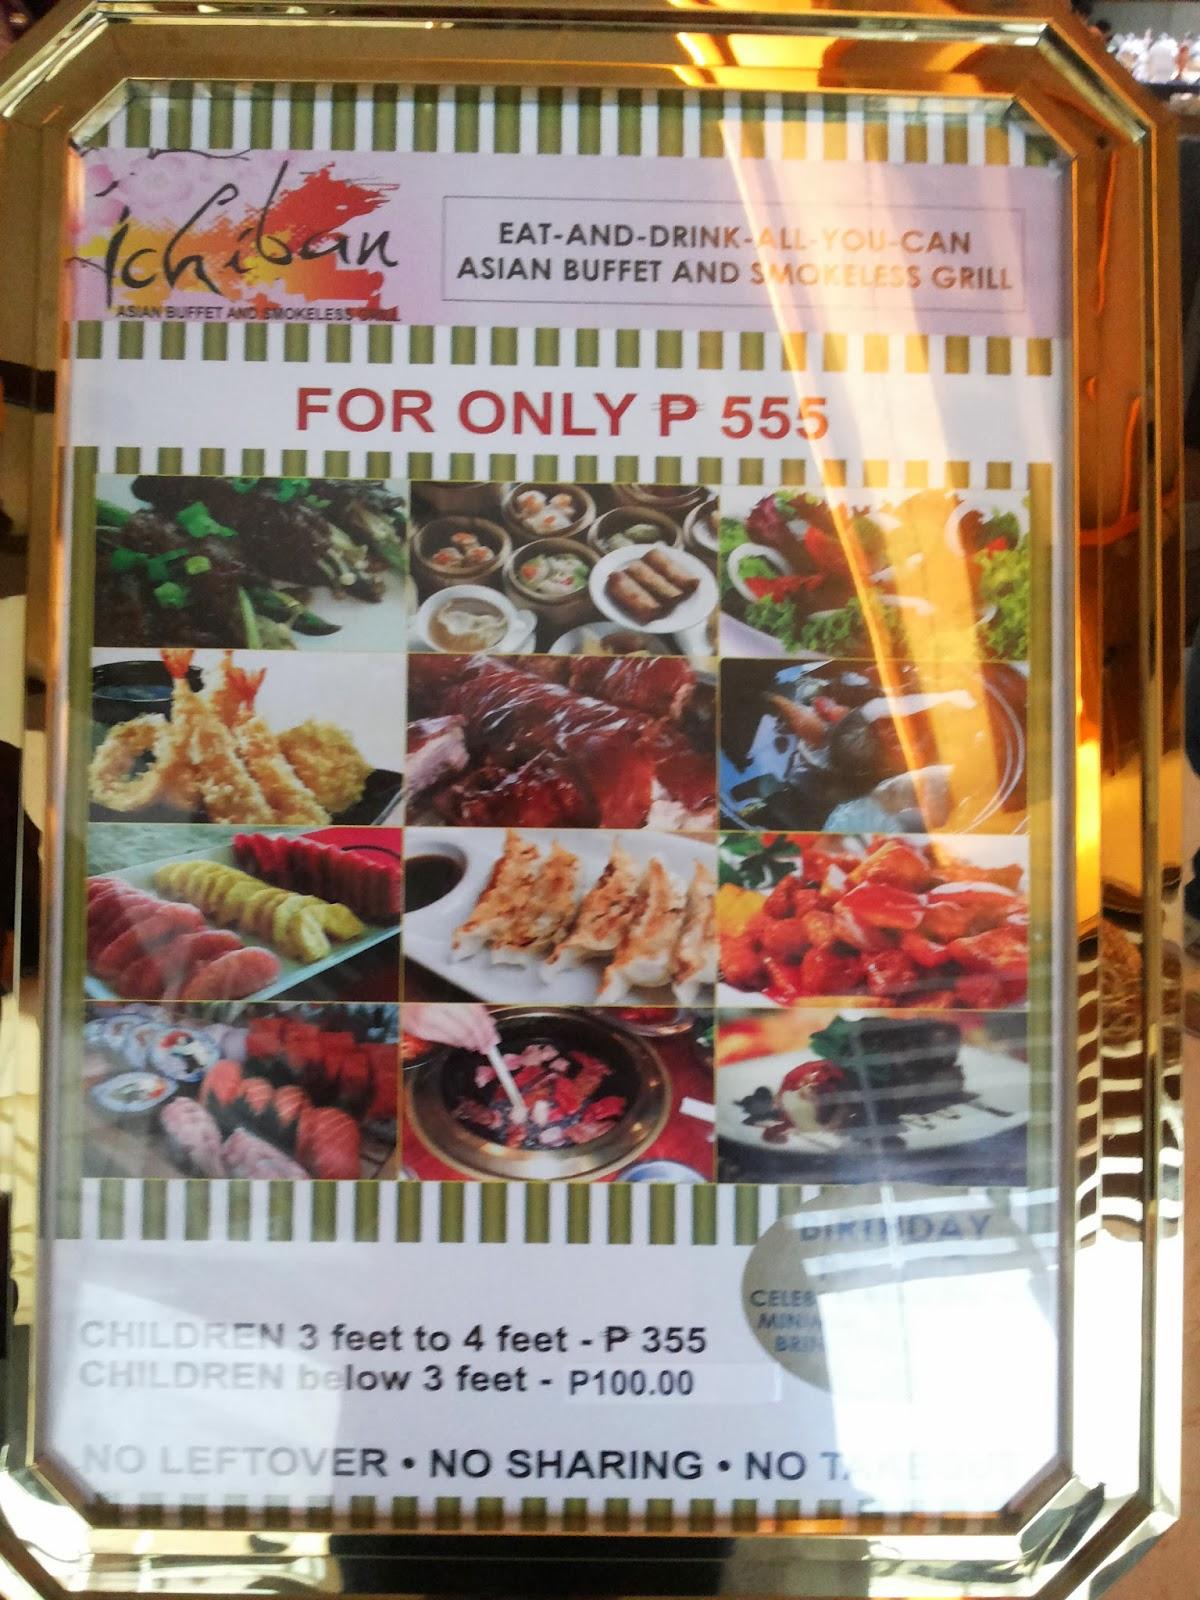 where to eat in san fernando pampanga ichiban mix buffet and rh binibiningwanderlust com ichiban buffet price flowood ms ichiban buffet price pampanga